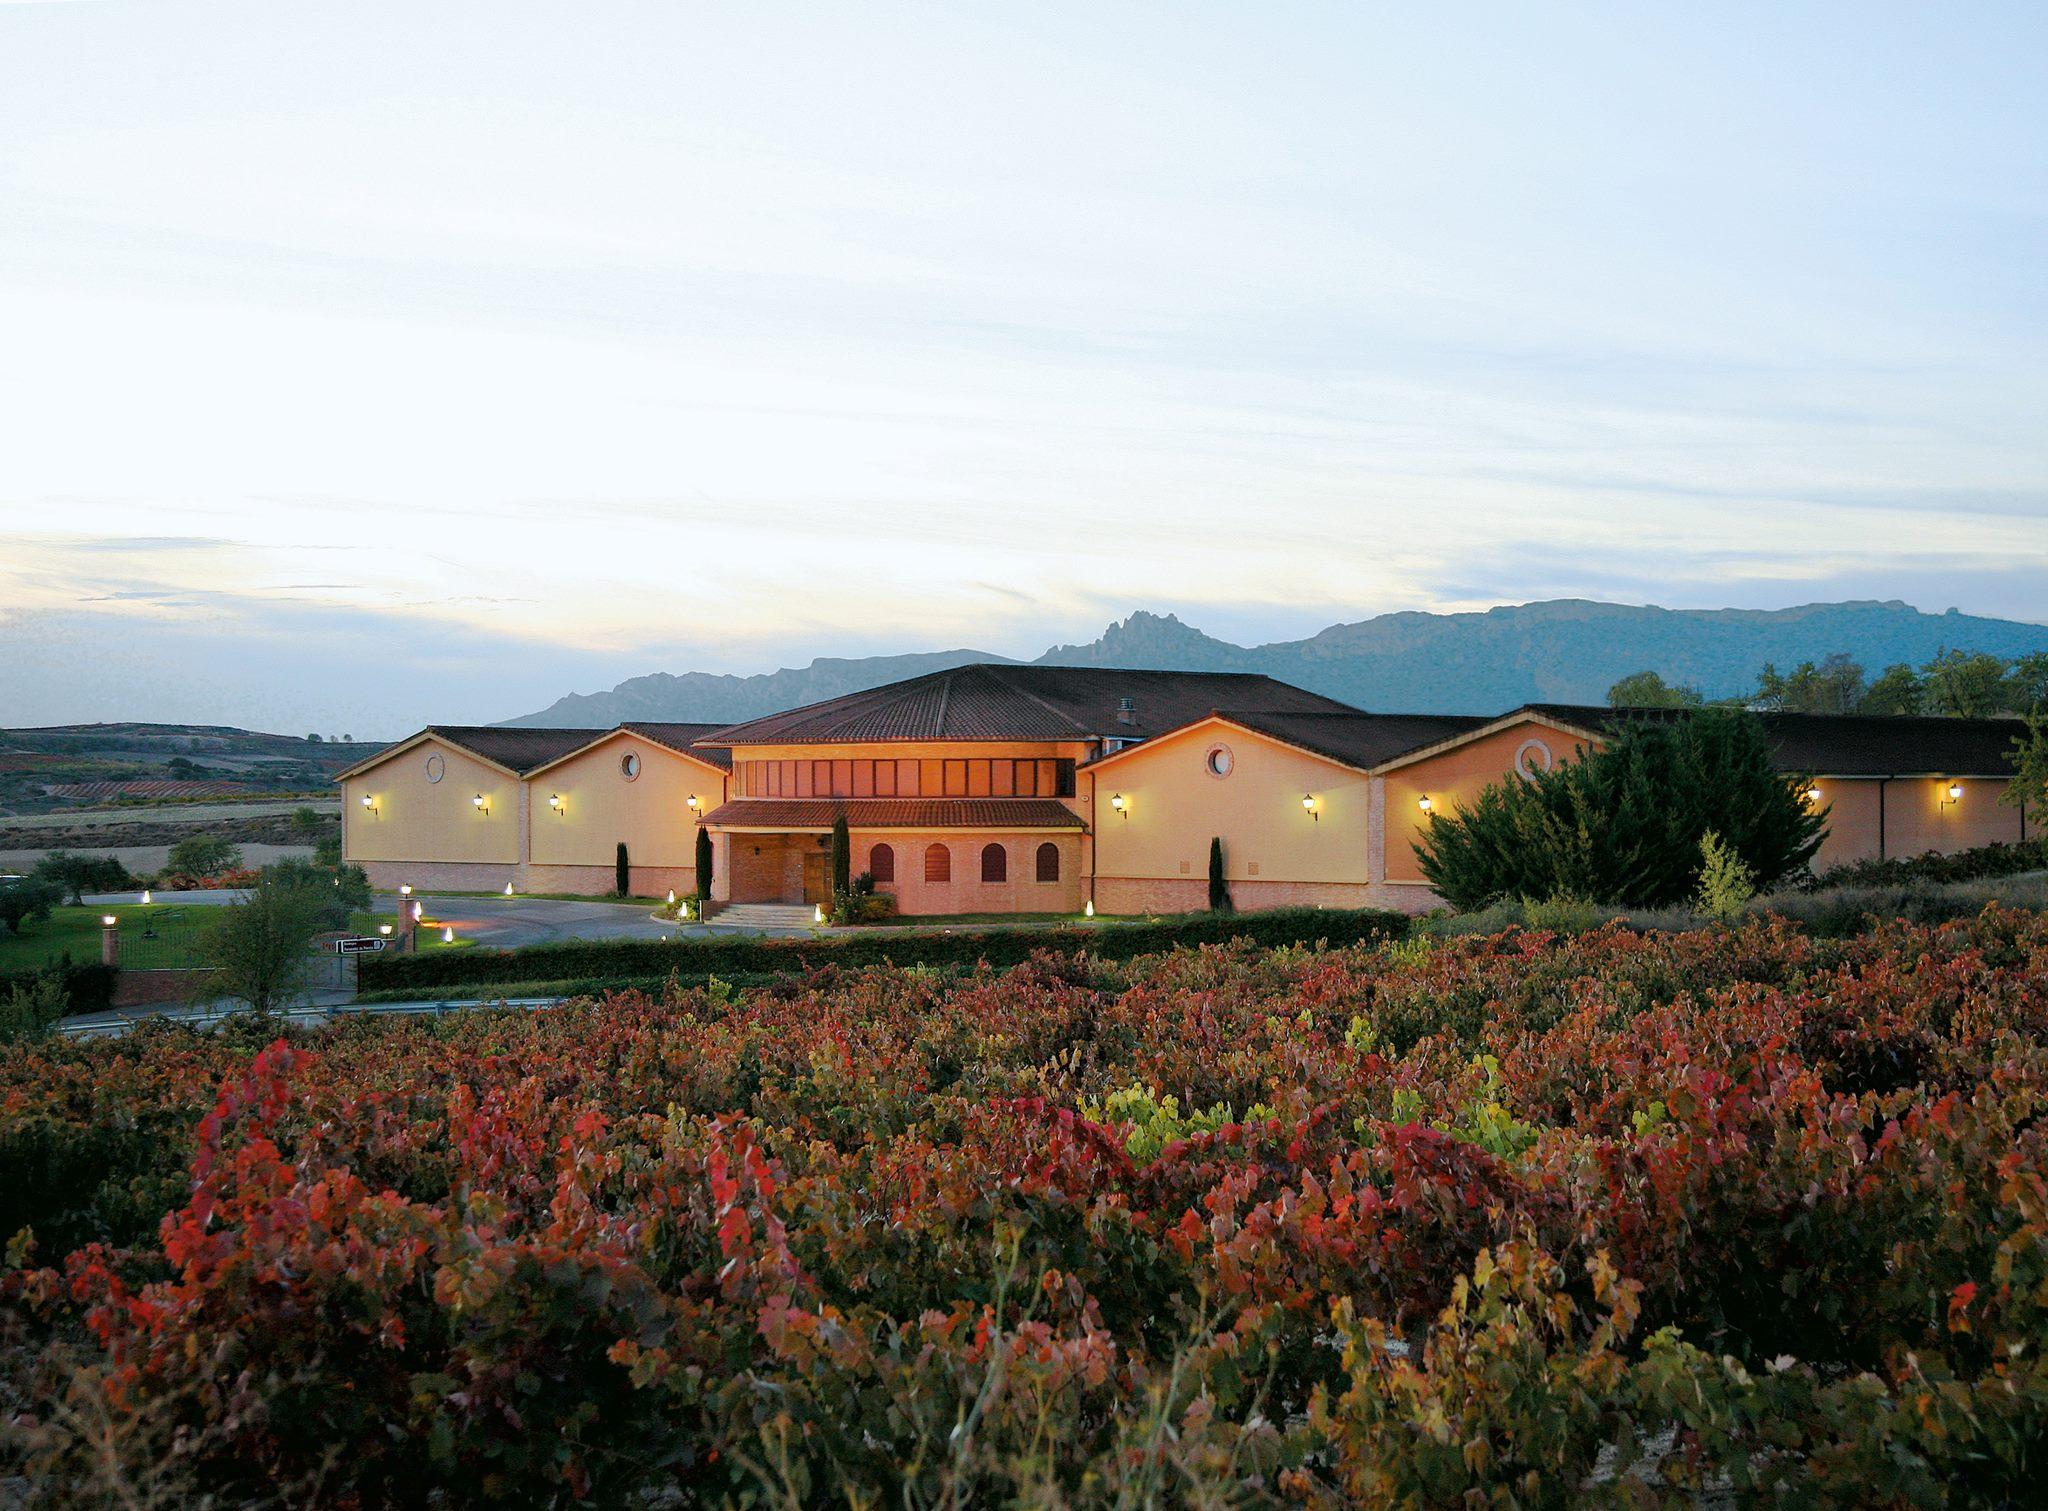 Bodegas Fernández de Piérola winery estate located in Spain